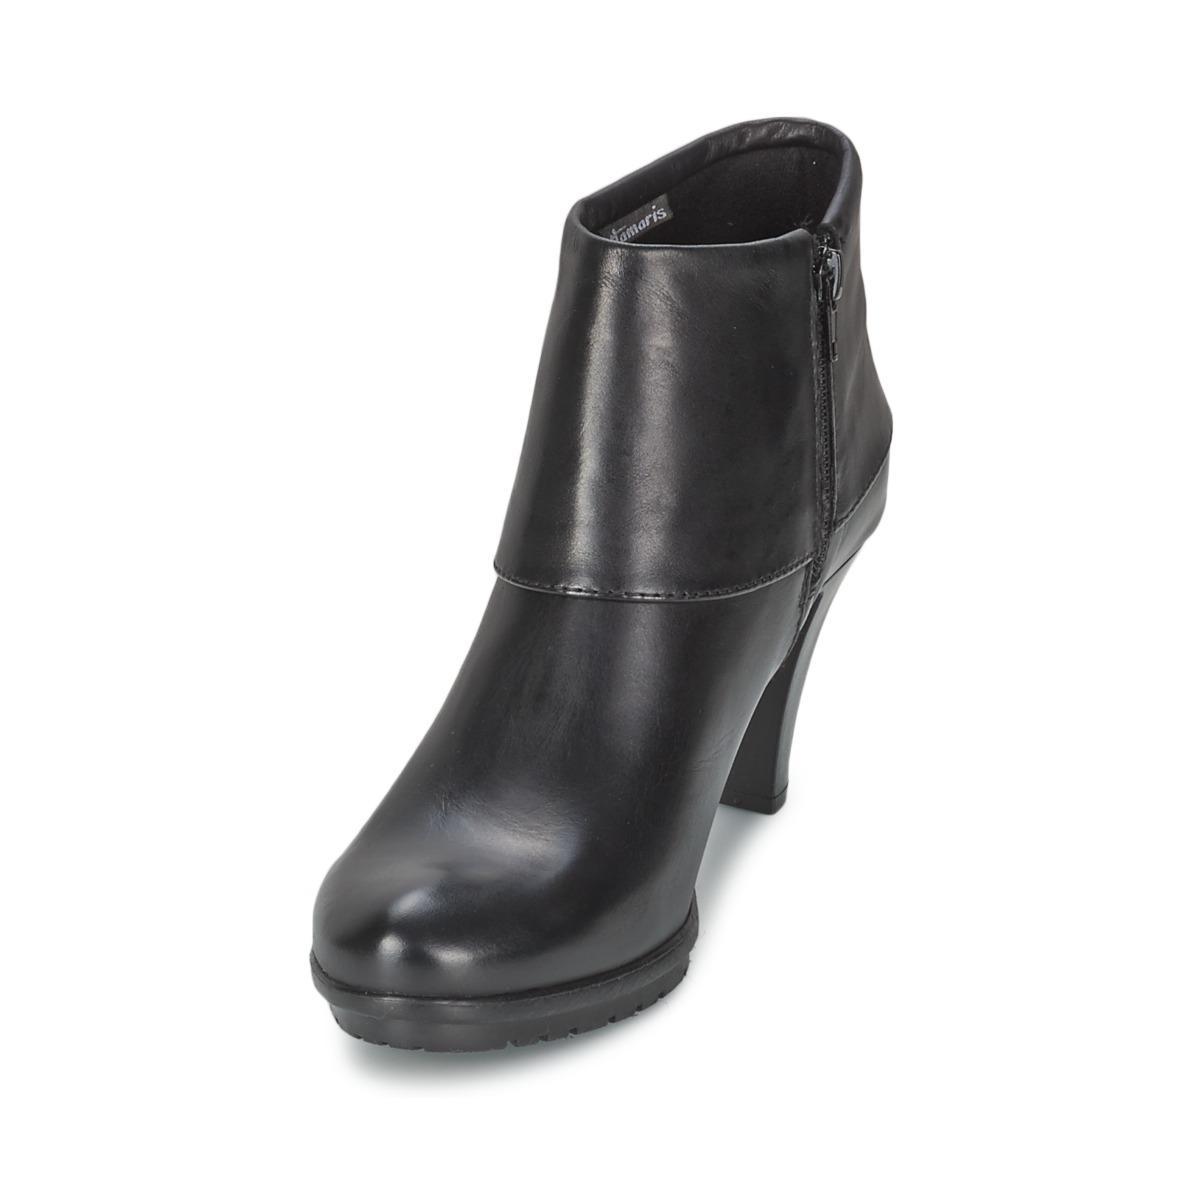 Tamaris Leather Olaya Low Boots in Black